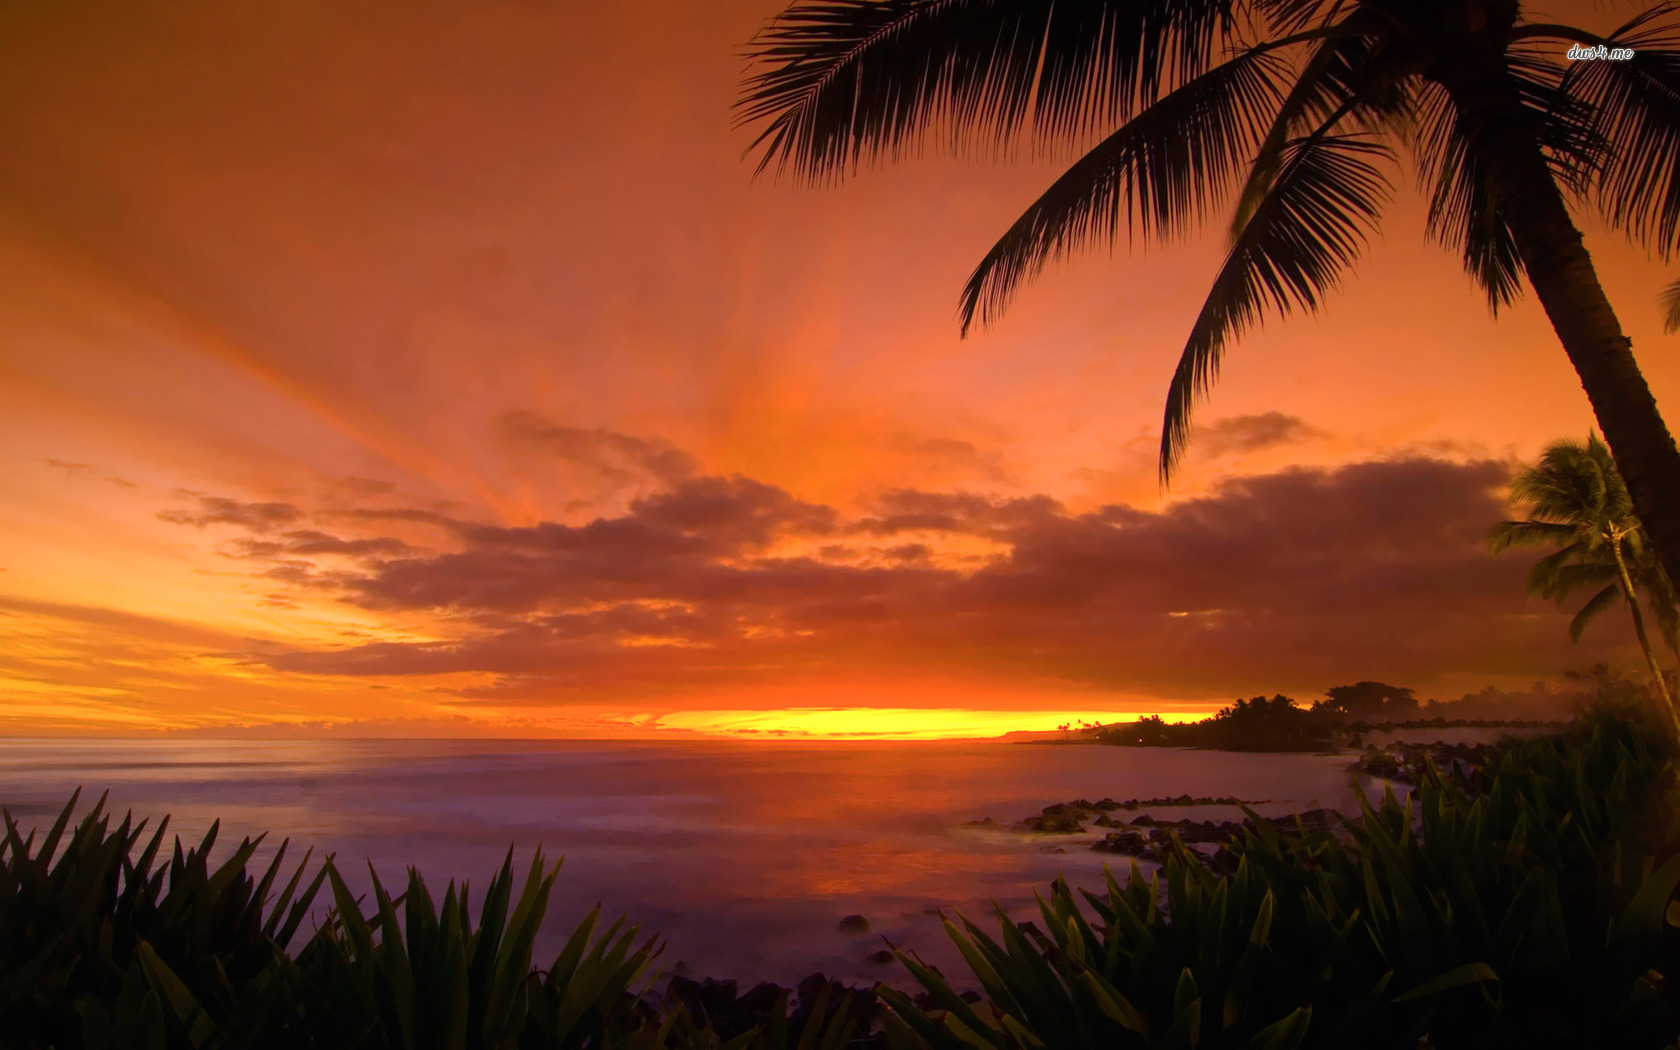 [40+] Sunset Hawaii Beach Wallpapers on WallpaperSafari